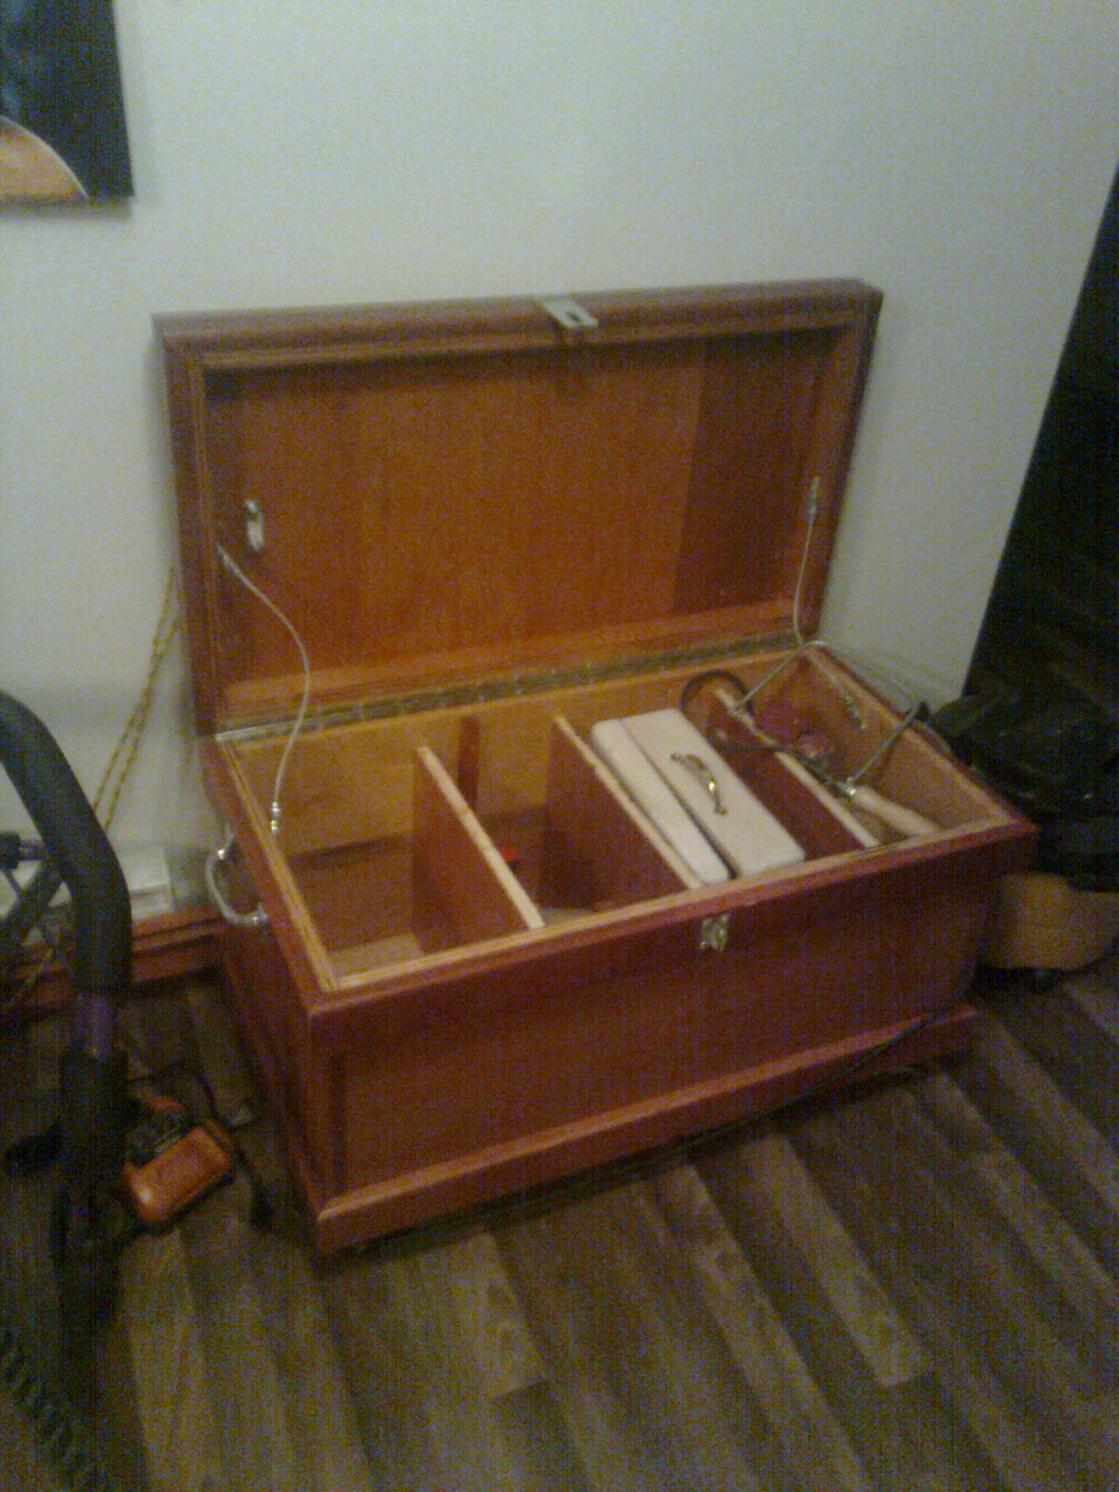 old homemade tool boxes-cherrybox1.jpg